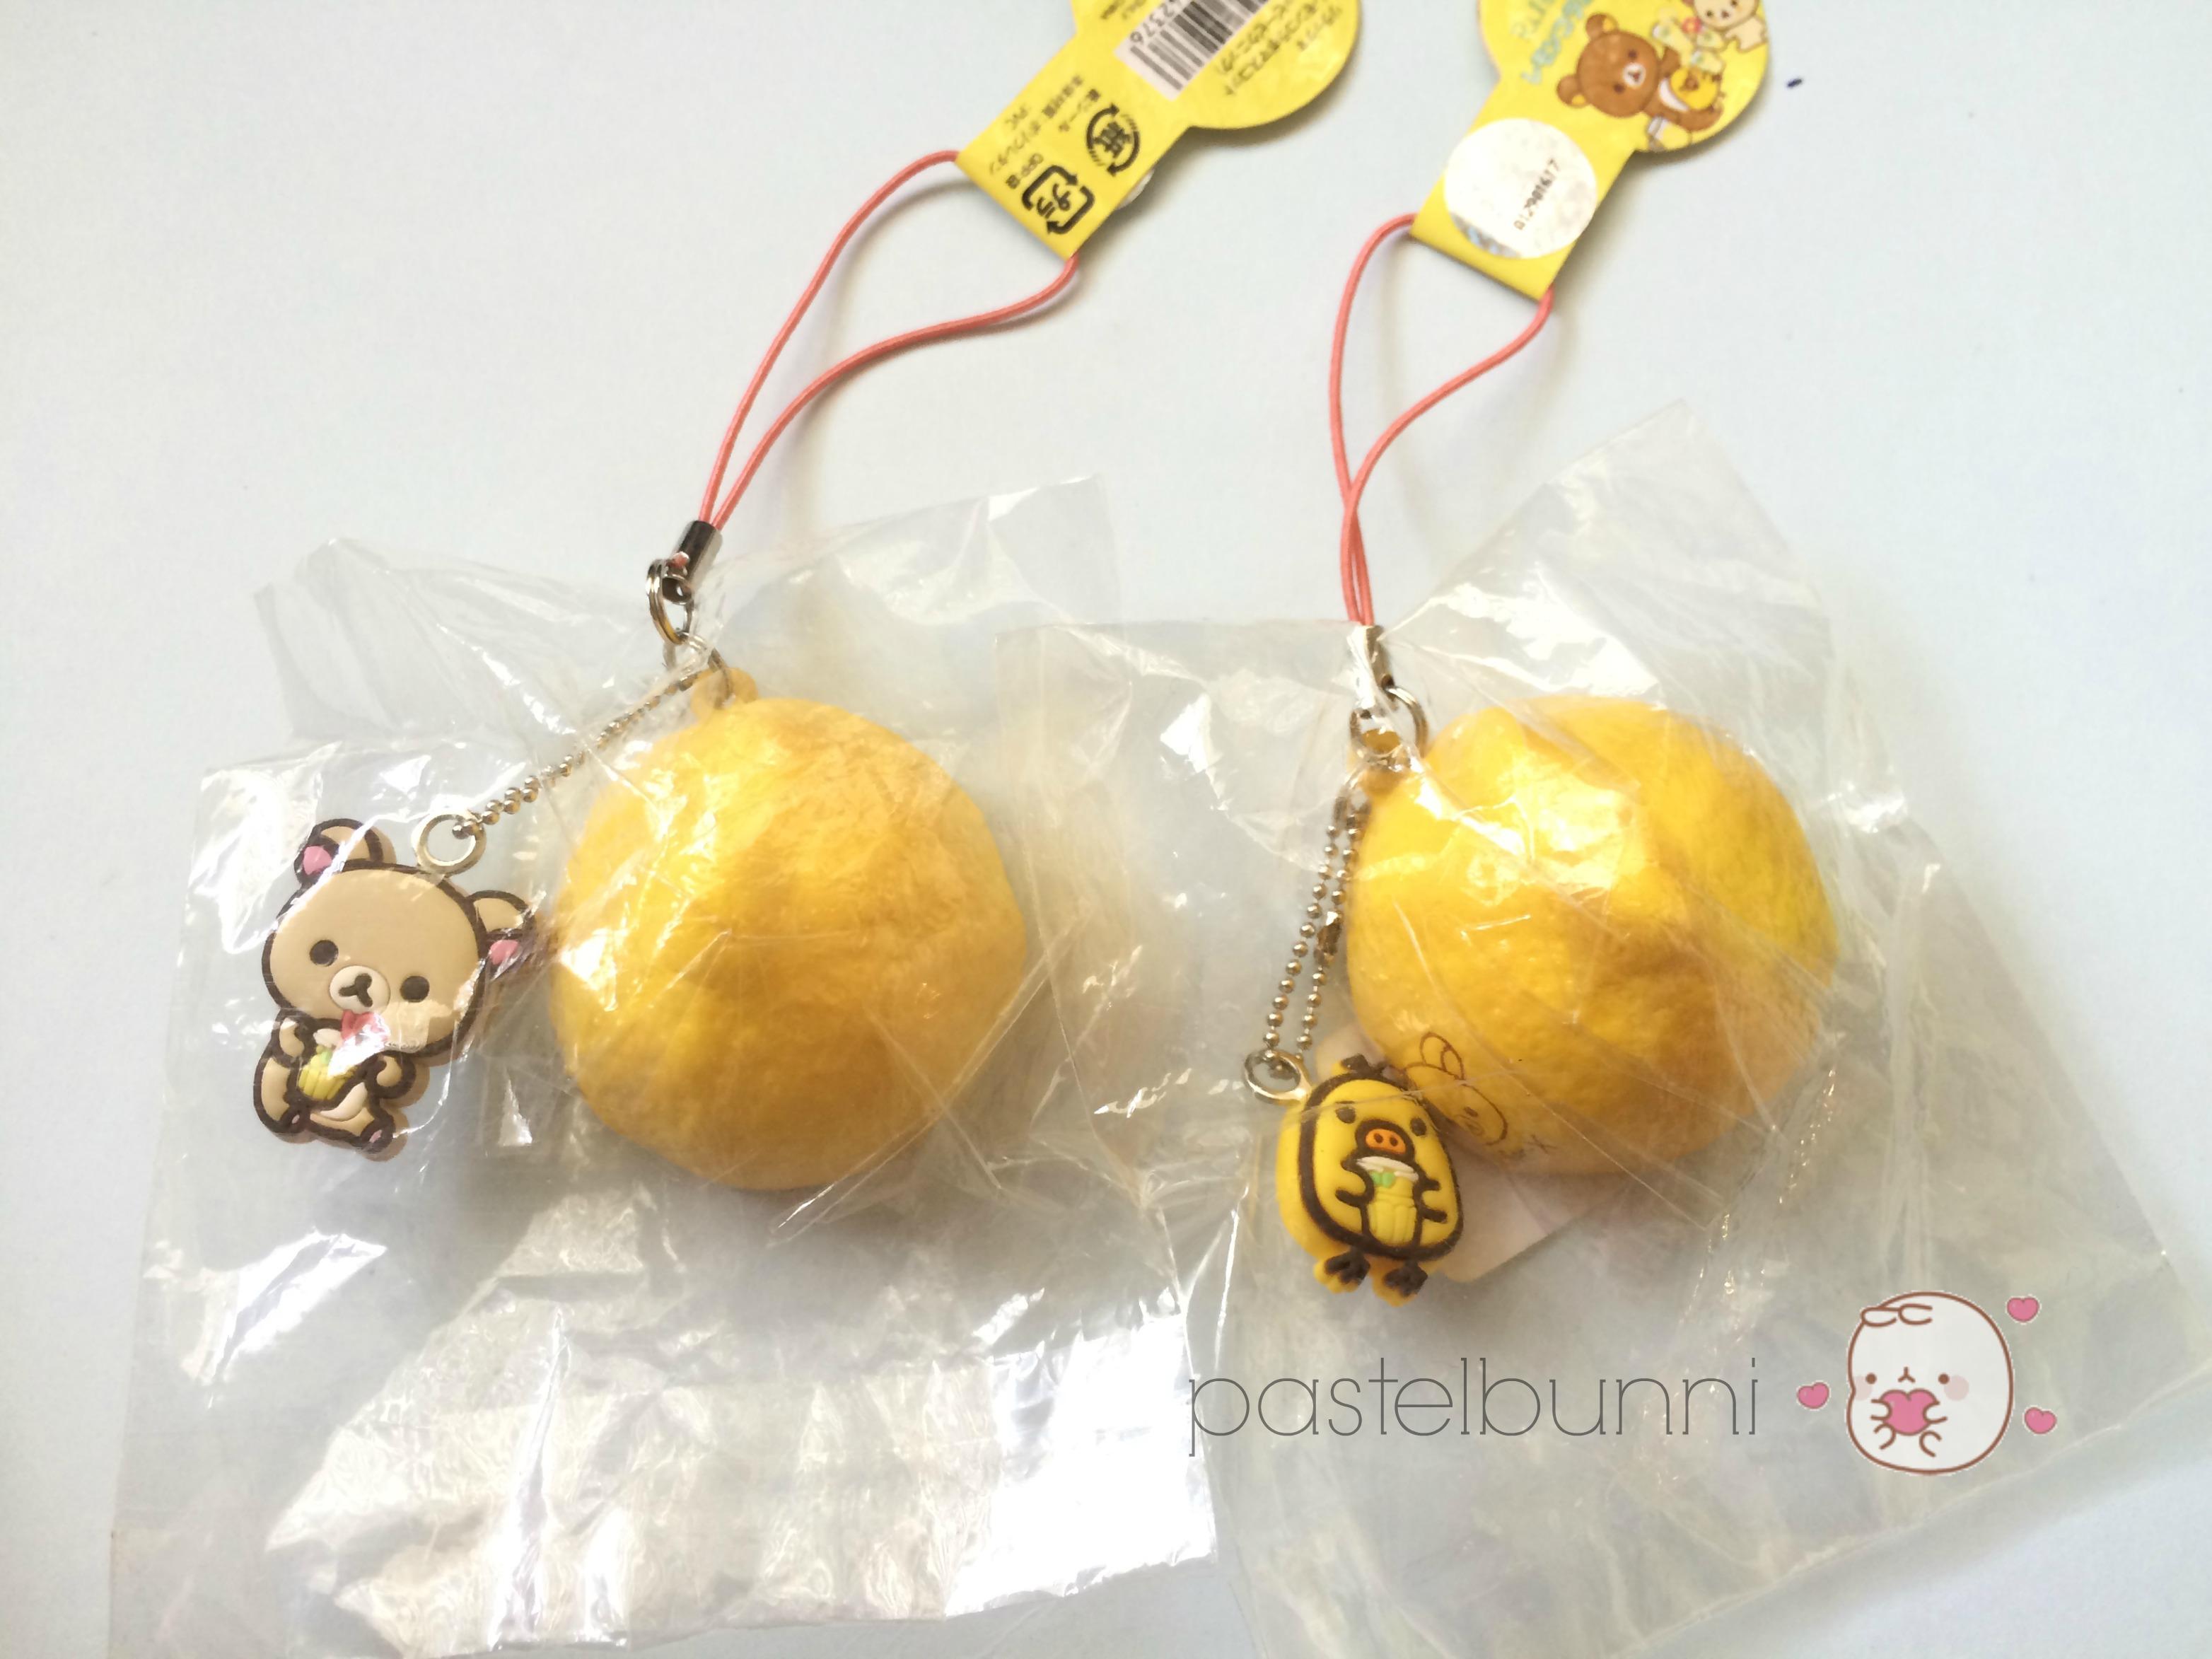 Rilakkuma Tag Squishy Supplier : Rare Rilakkuma Korilakkuma Kiiroitori Lemon tagged tag squishy squishies ? PastelBunni ? Online ...